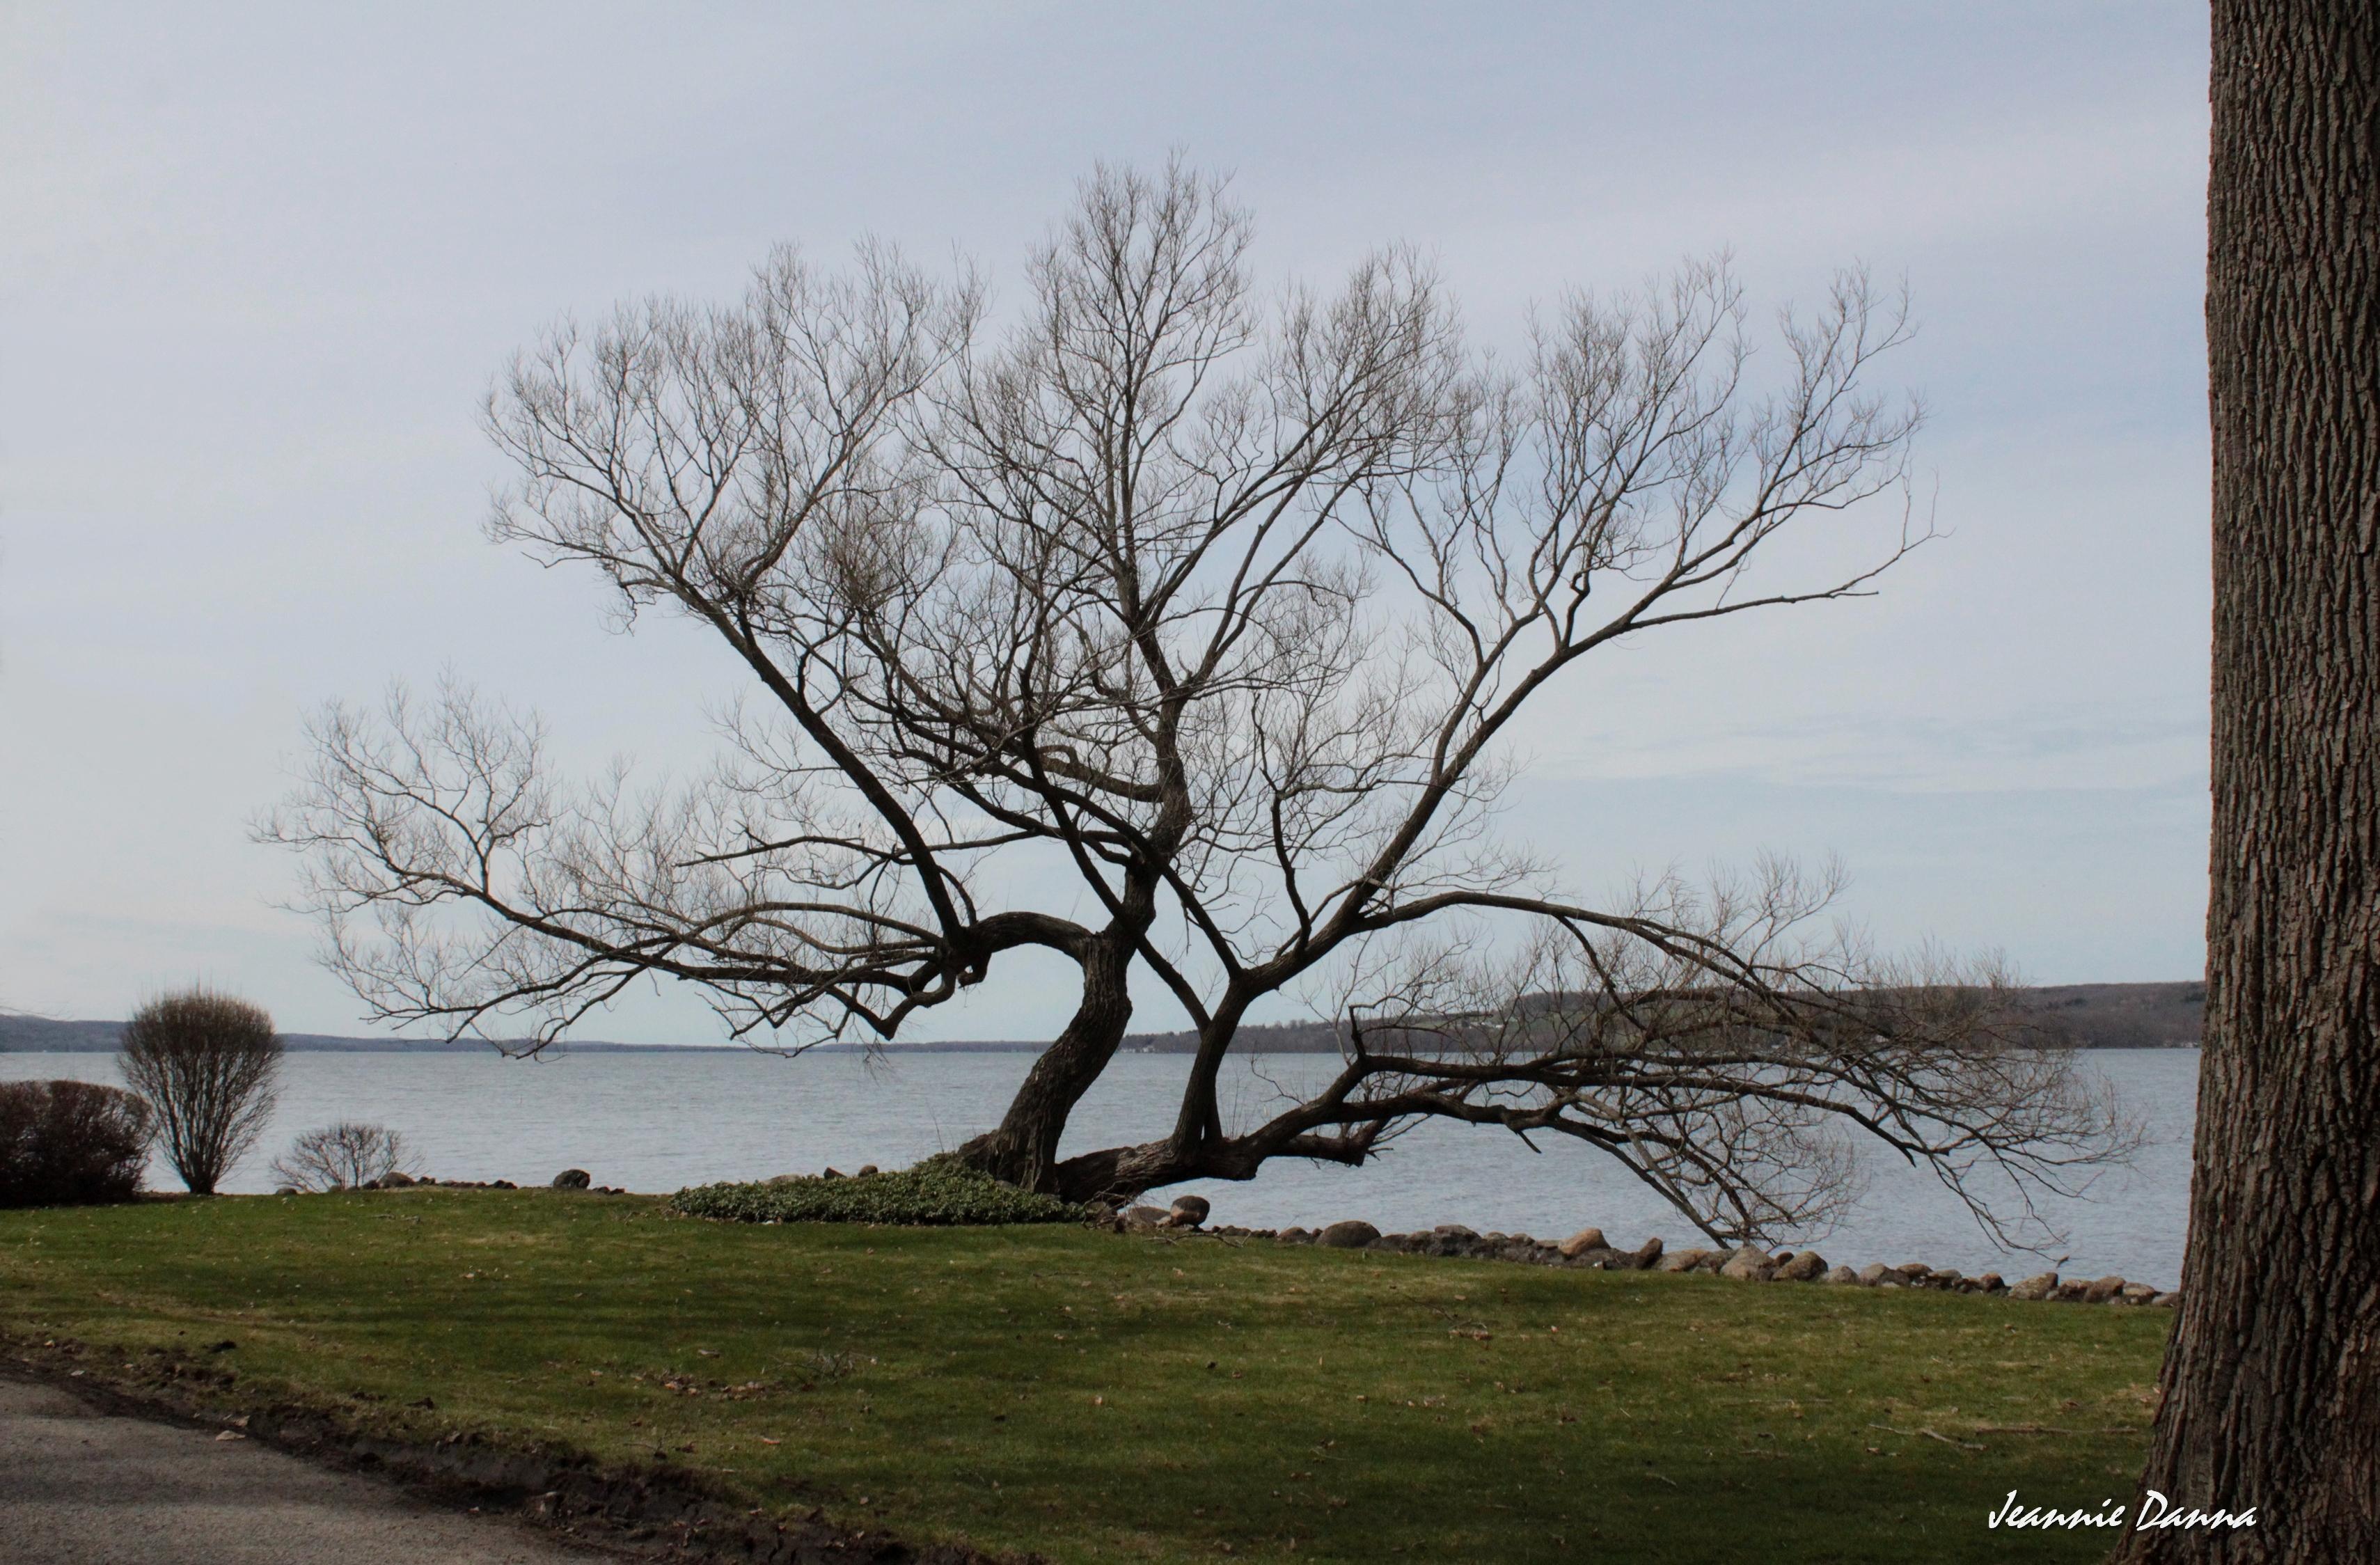 Chautauqua Lake Tree